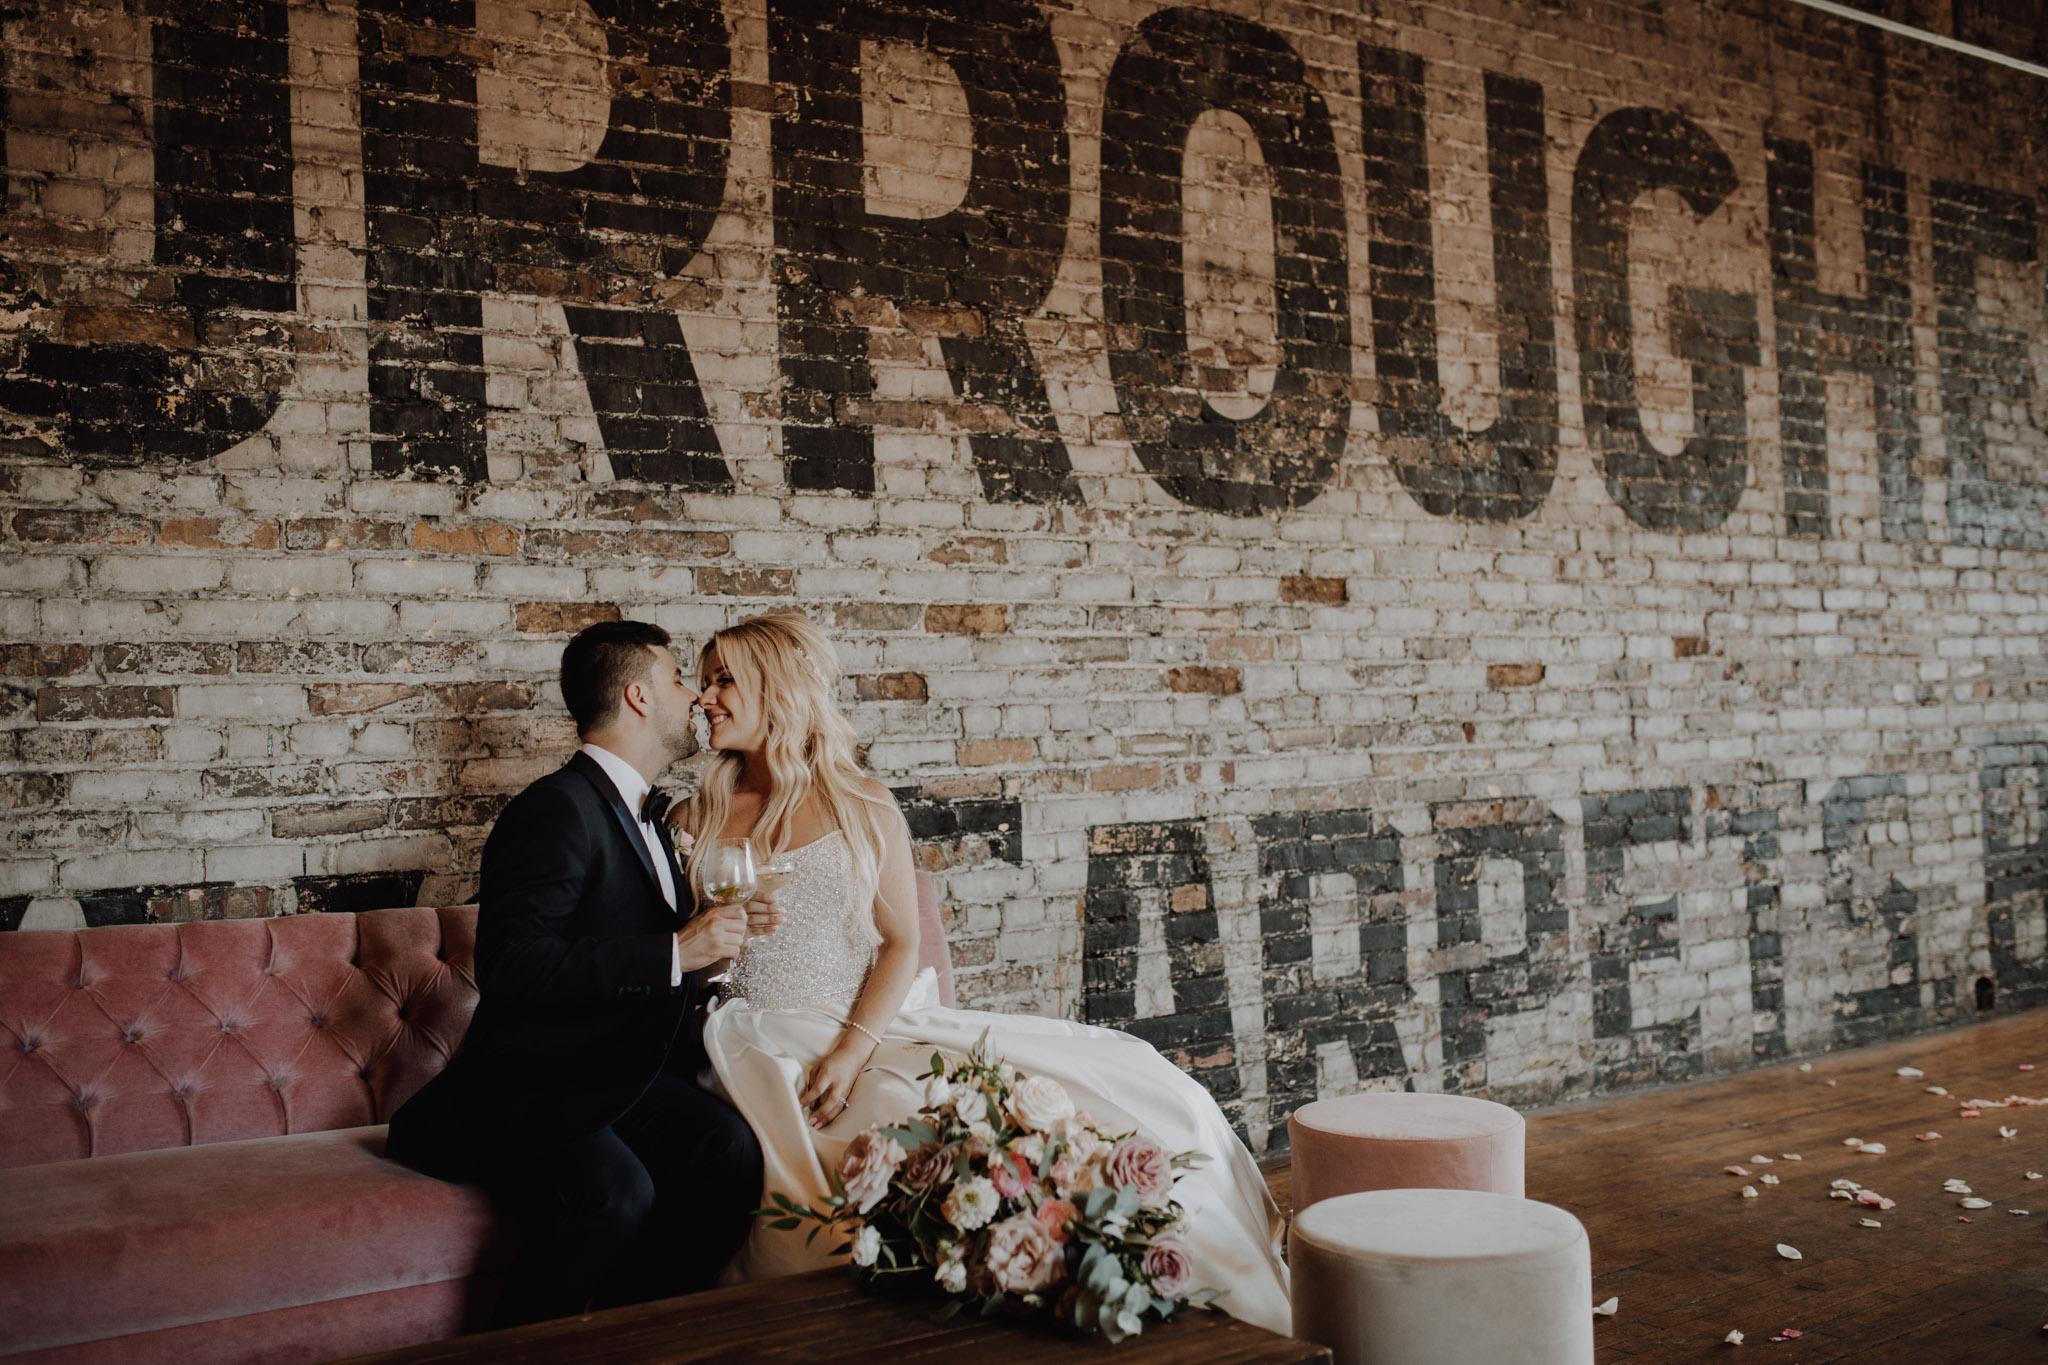 Pink velvet decor at The Burroughes Wedding. Love By Lynzie. Wedding Photographer Jennifer See Studios.